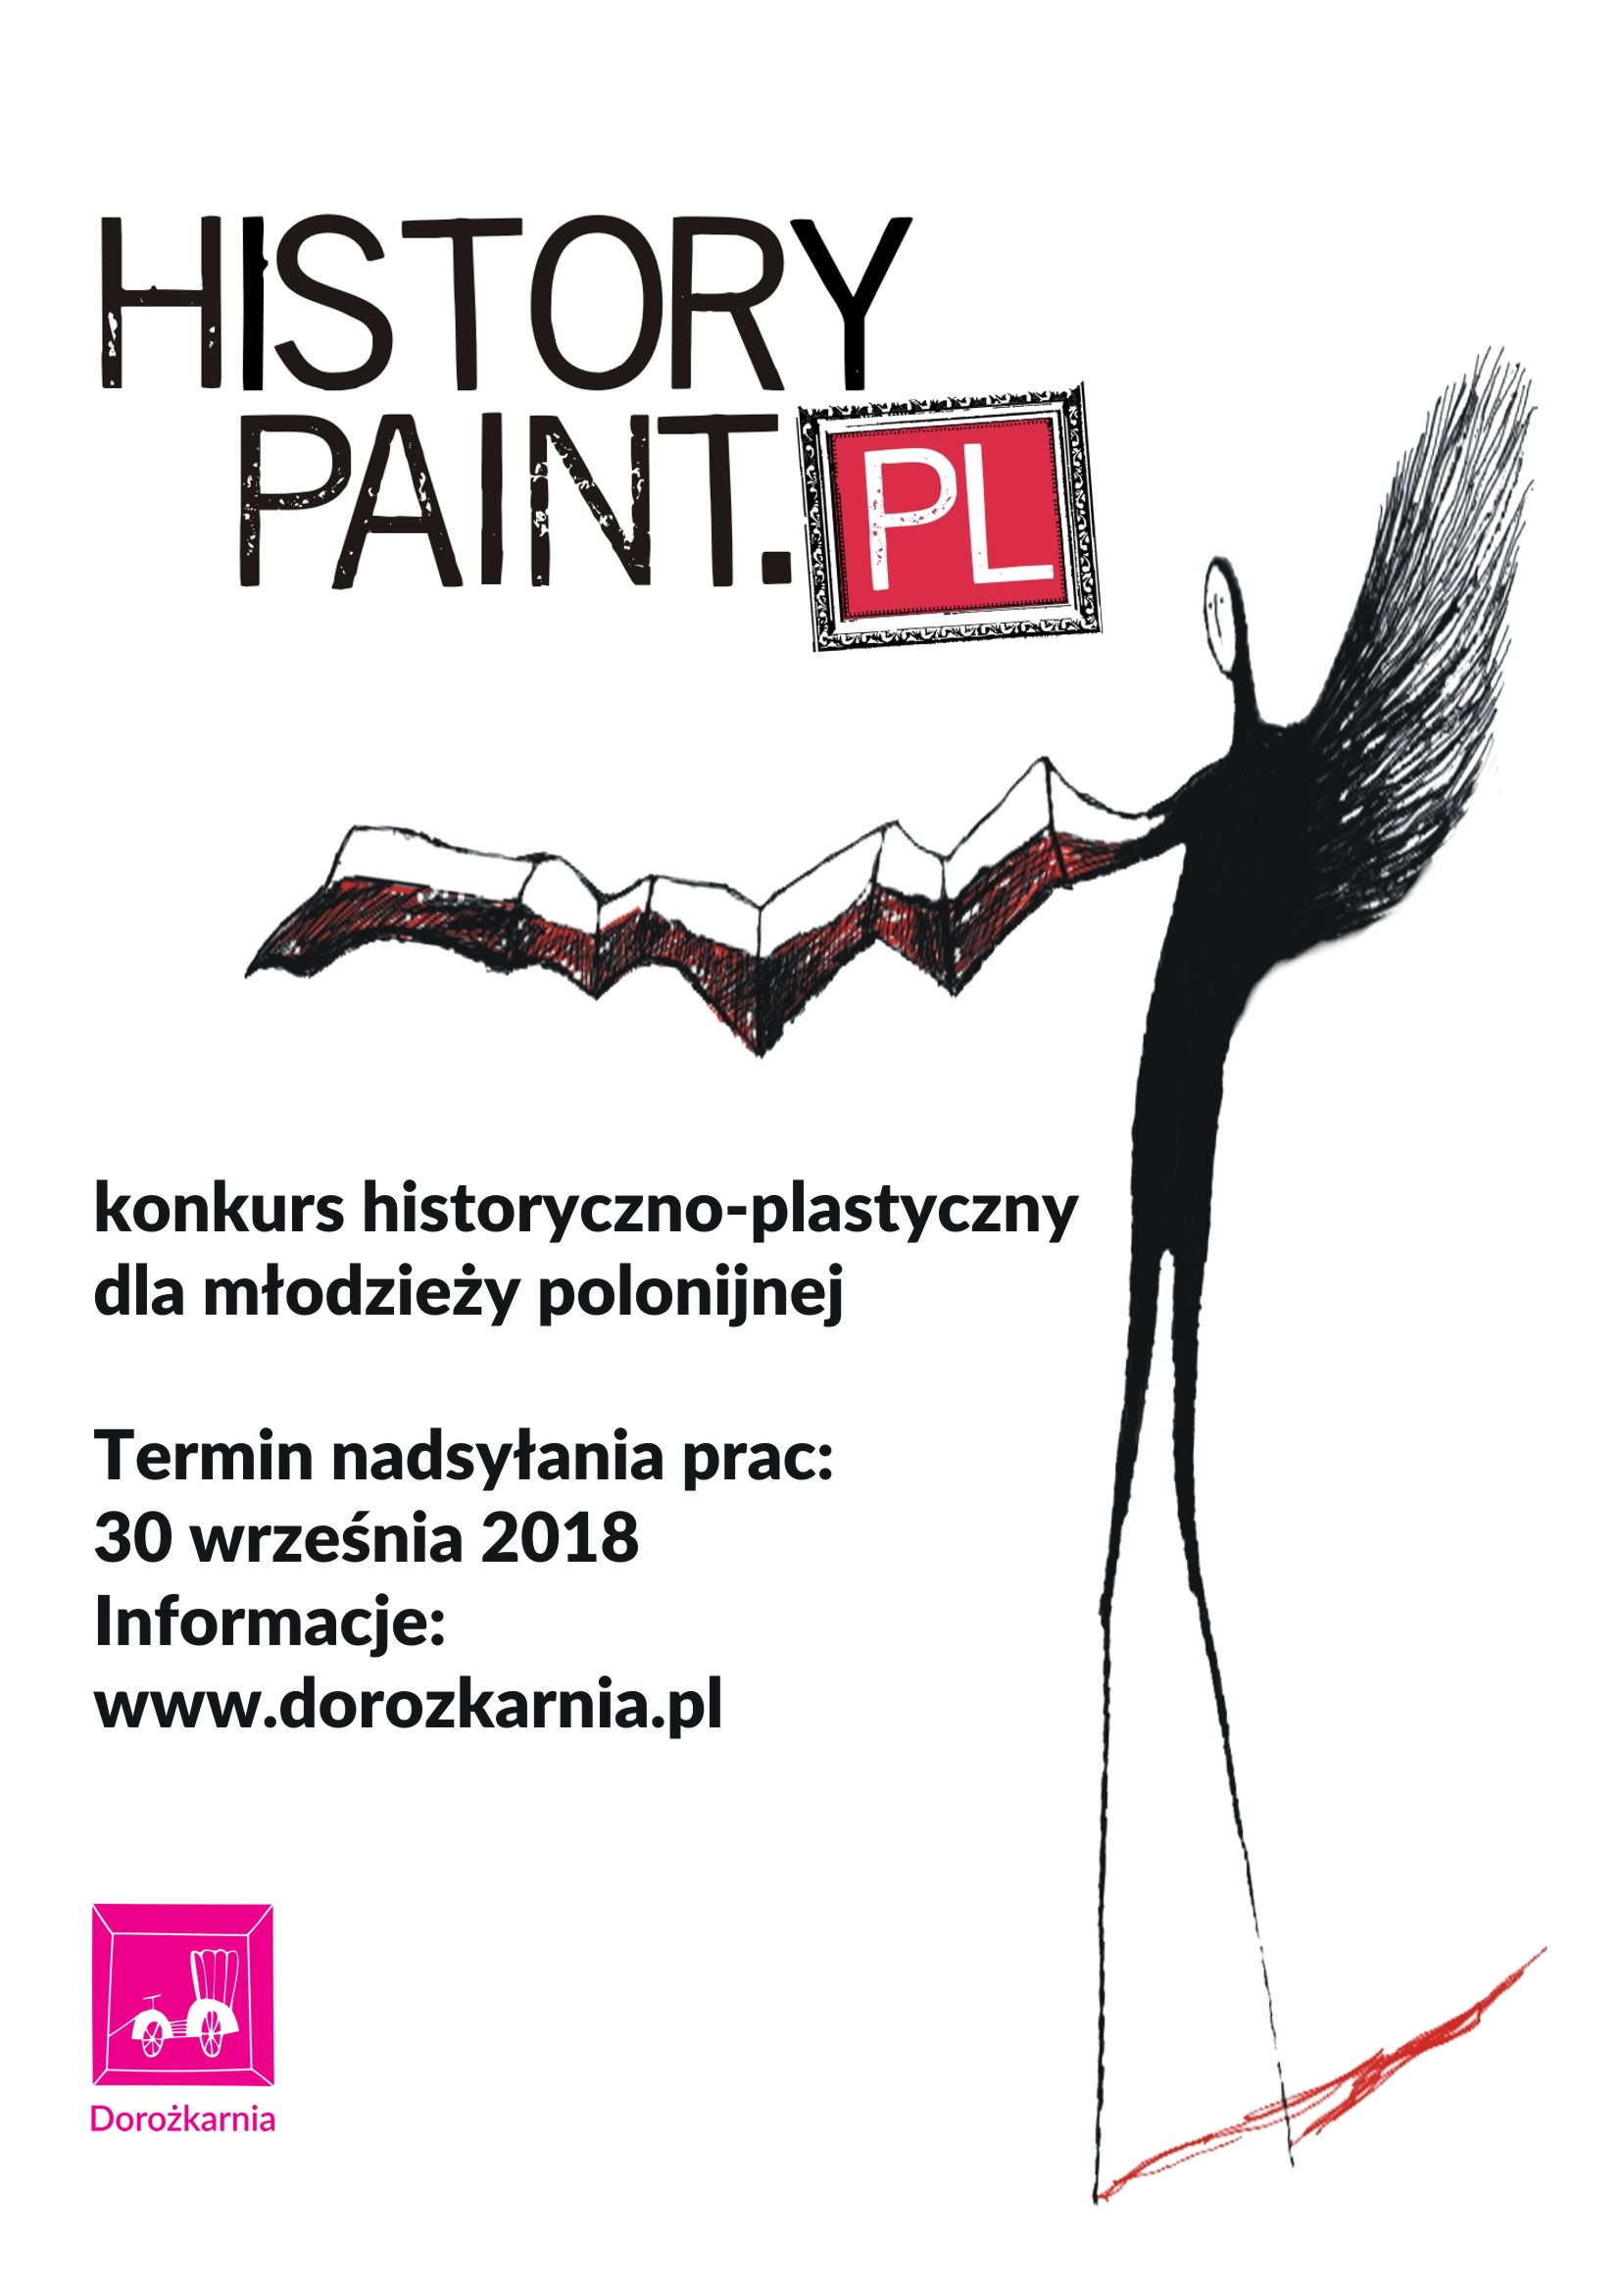 history art plakat